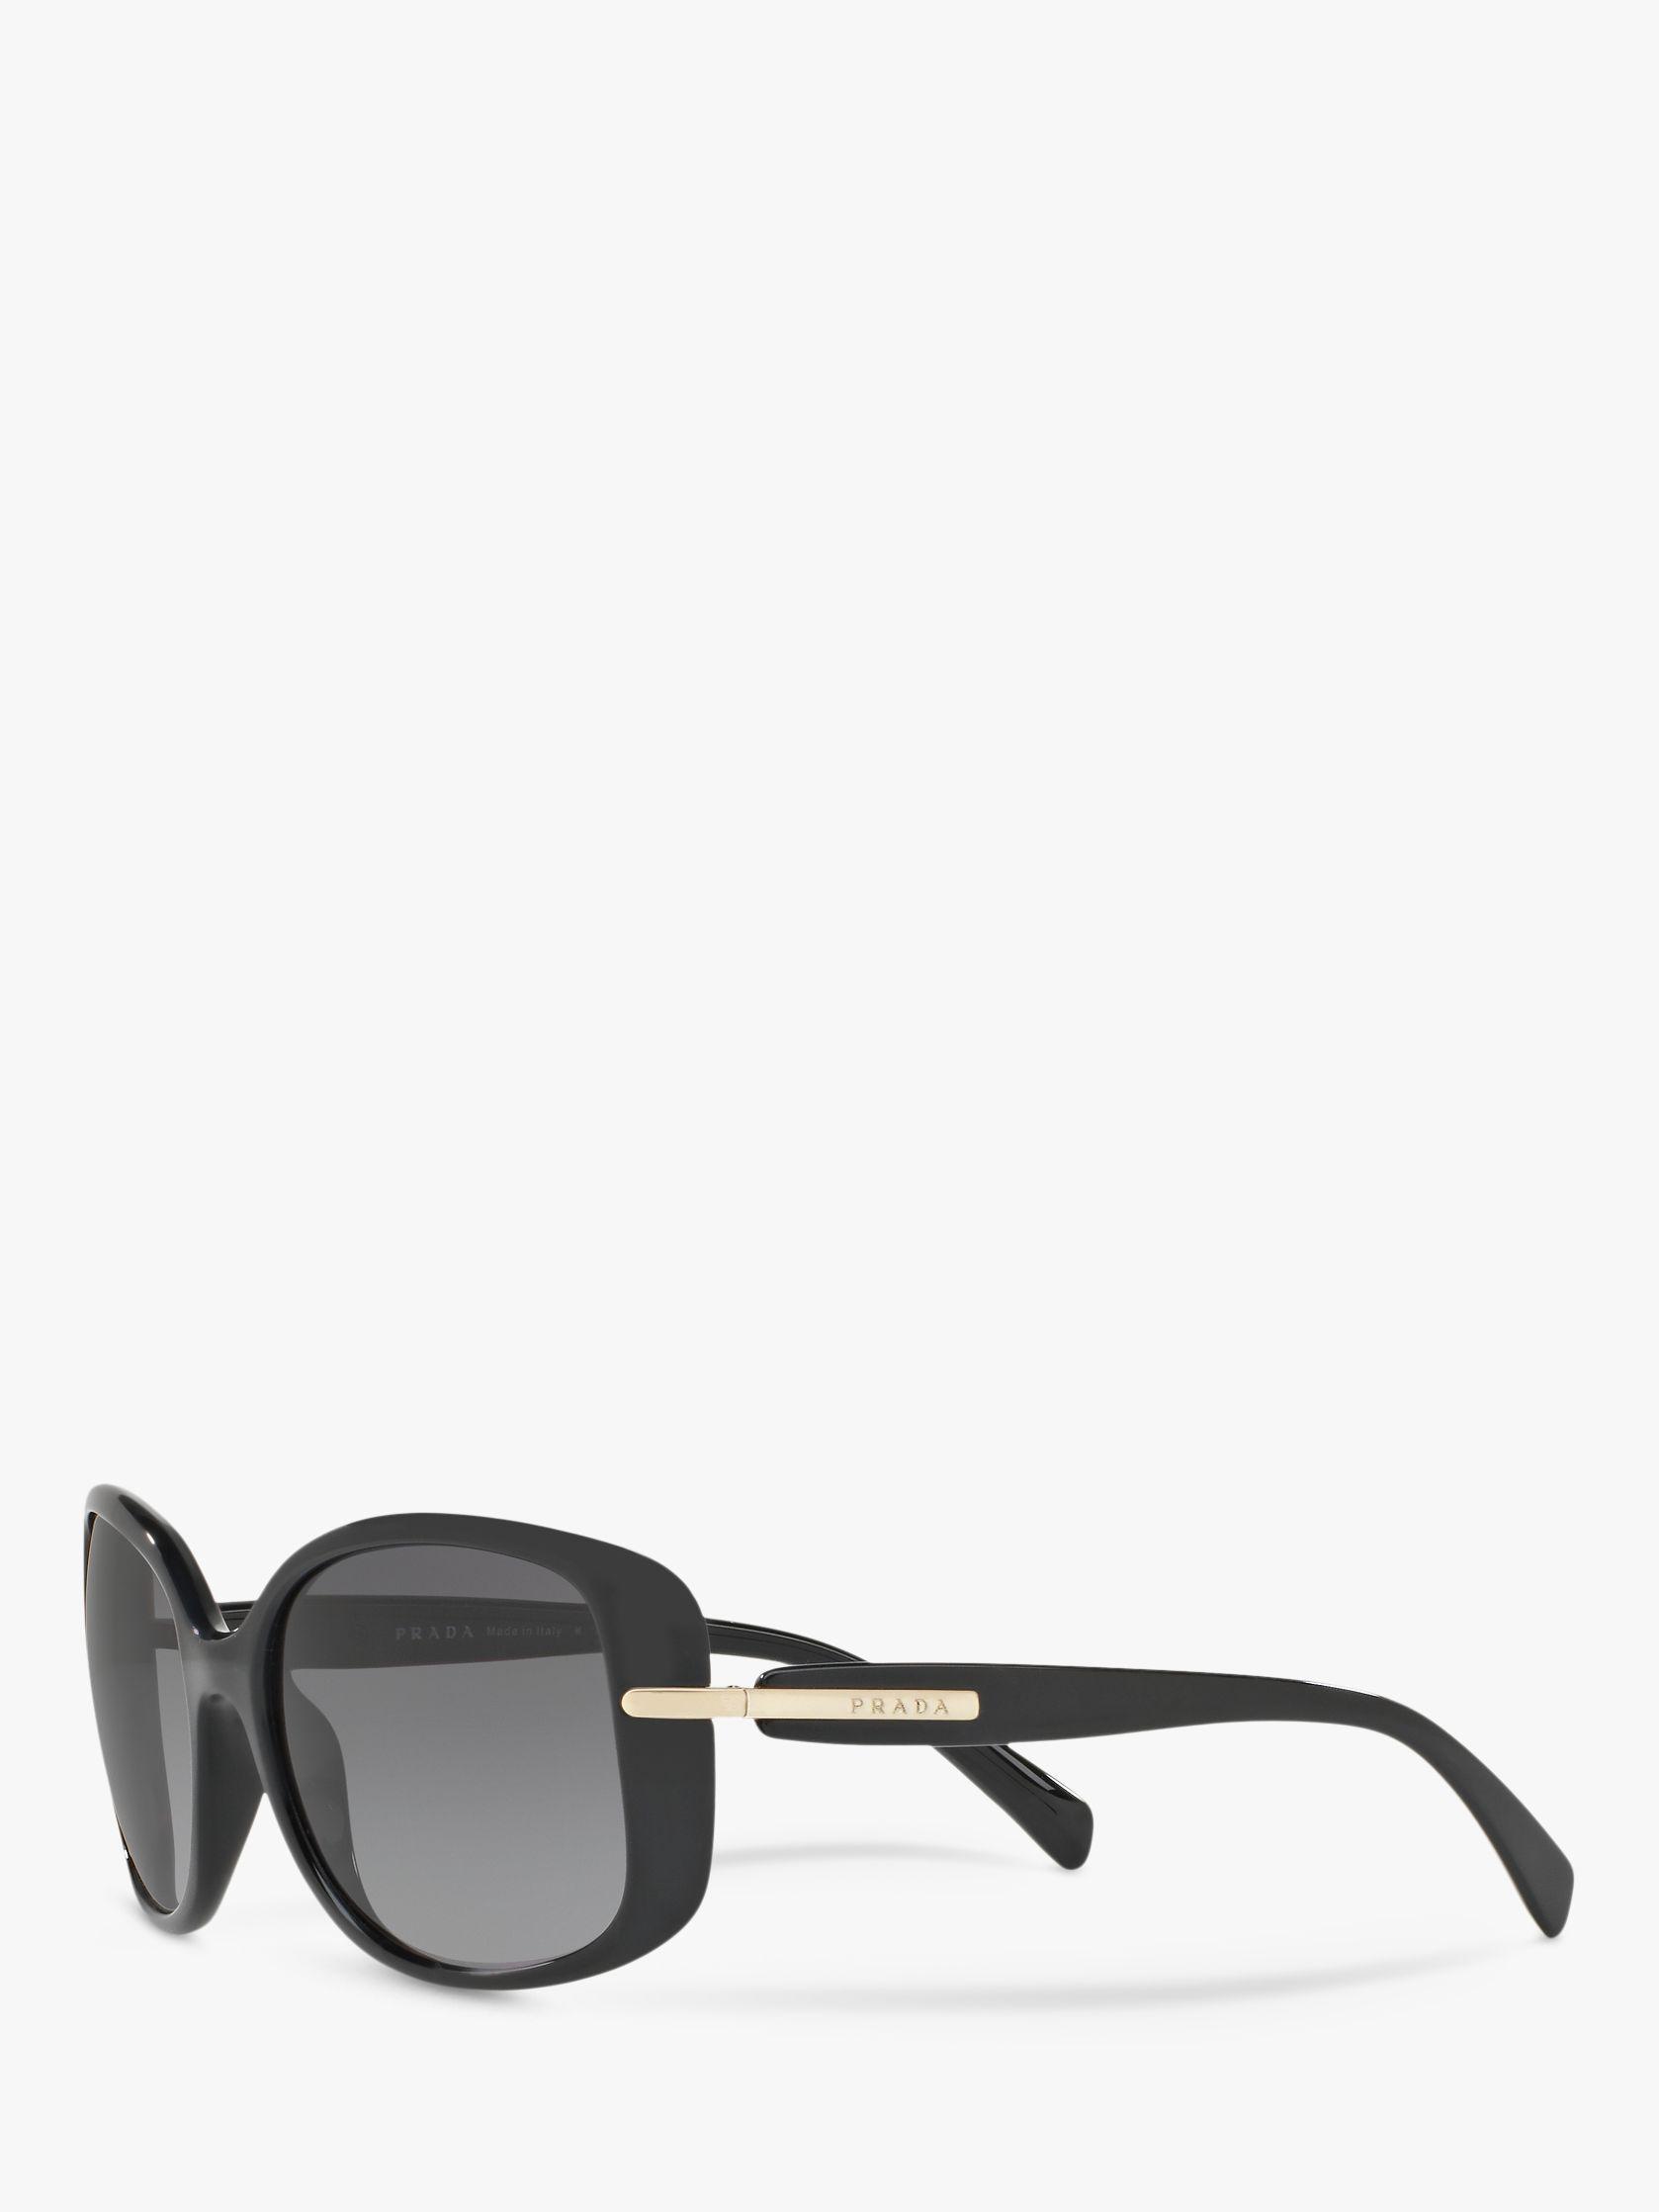 934eed61abe Prada - Black Pr 08os Women s Polarised Rectangular Sunglasses - Lyst. View  fullscreen